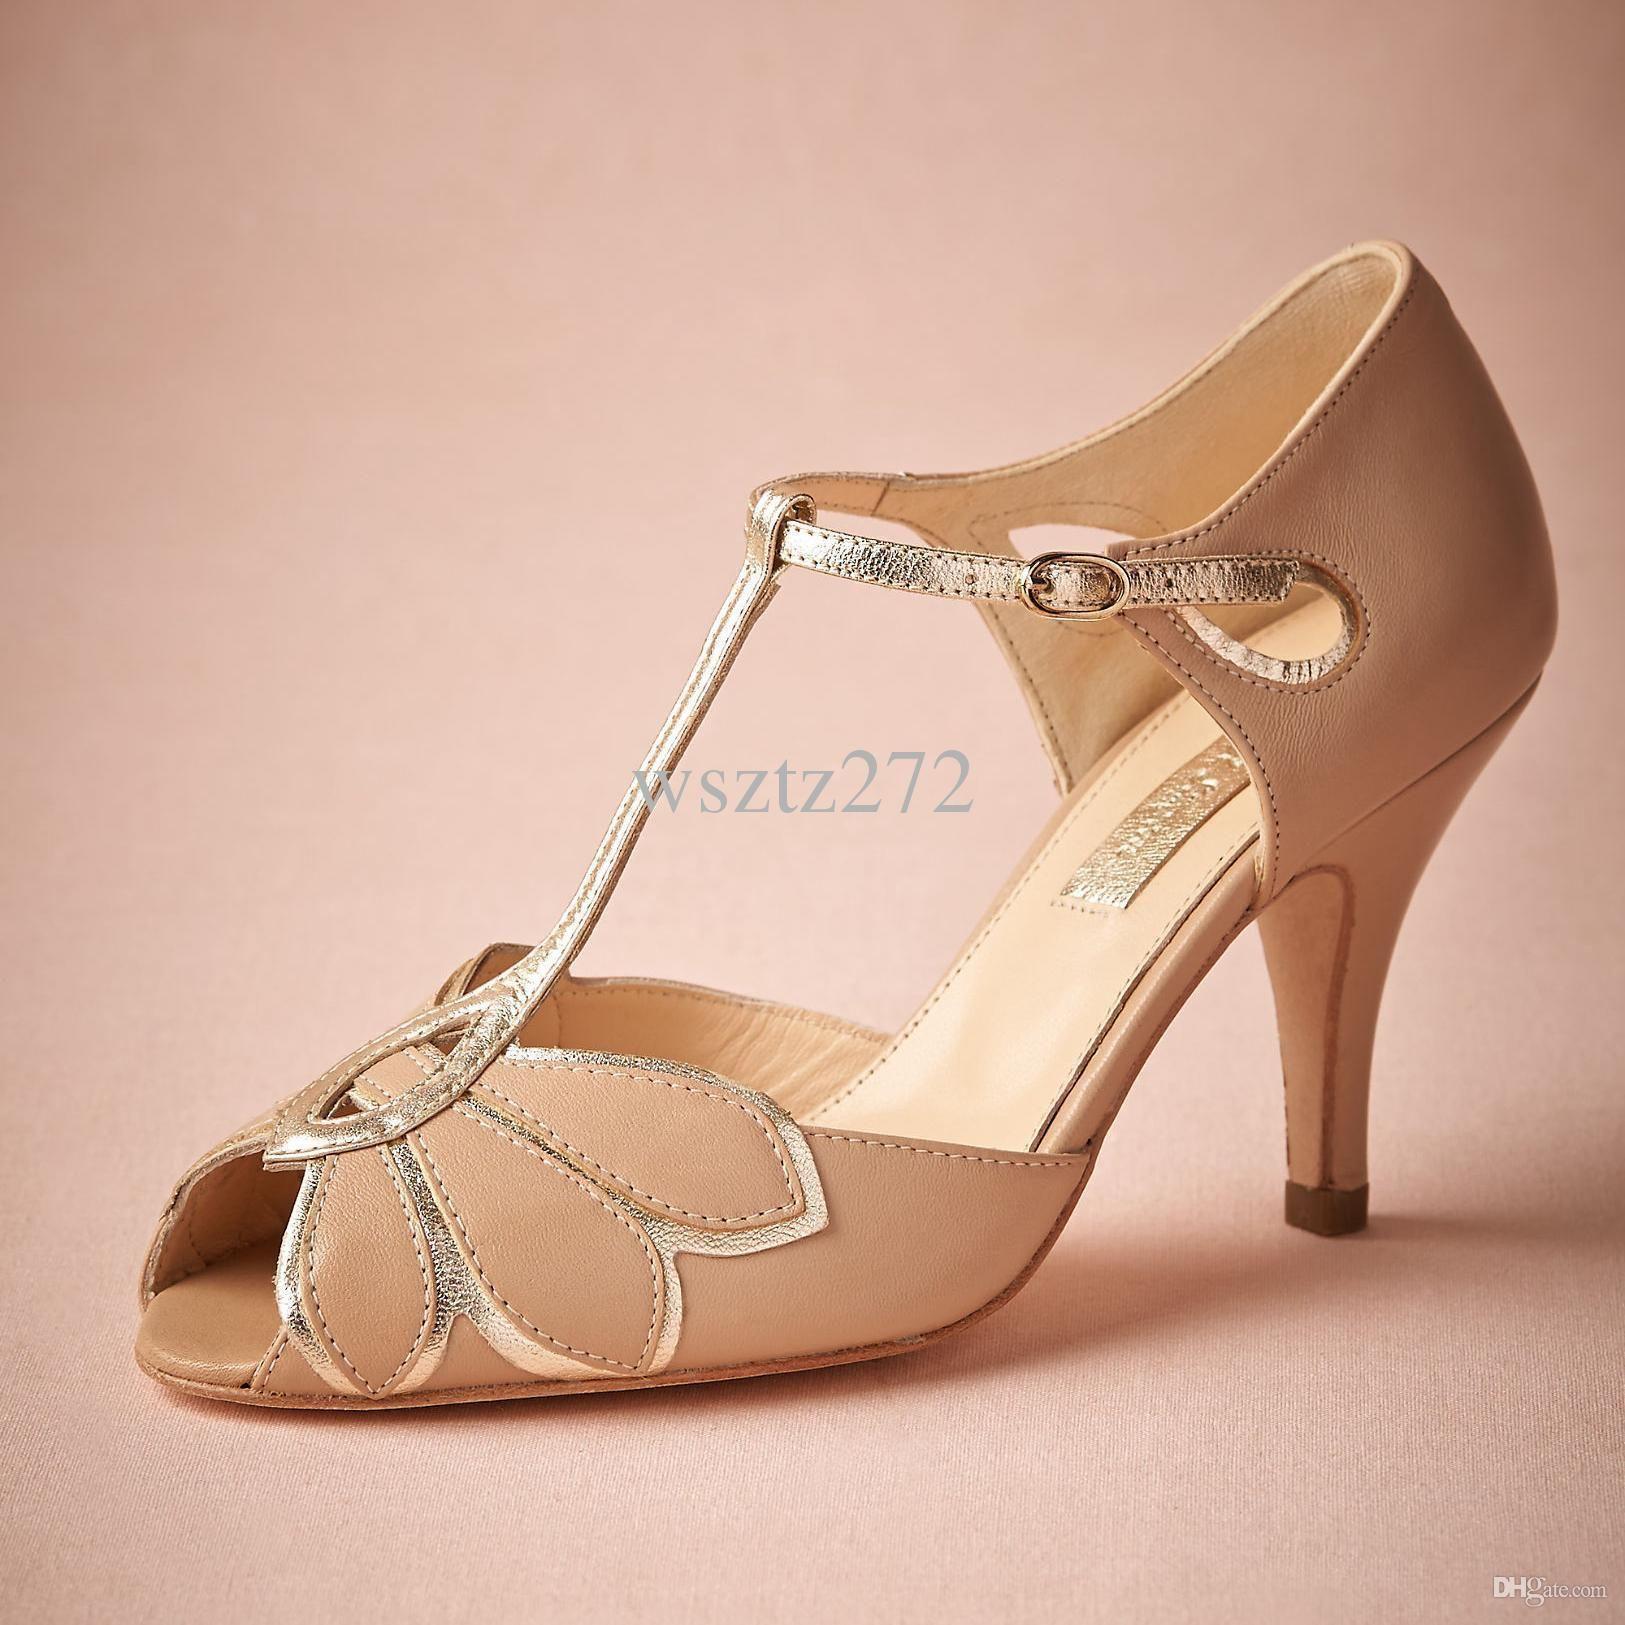 a1420aab196 Vintage Blush Wedding Shoes For Women Pumps T-Straps Buckle Closure ...